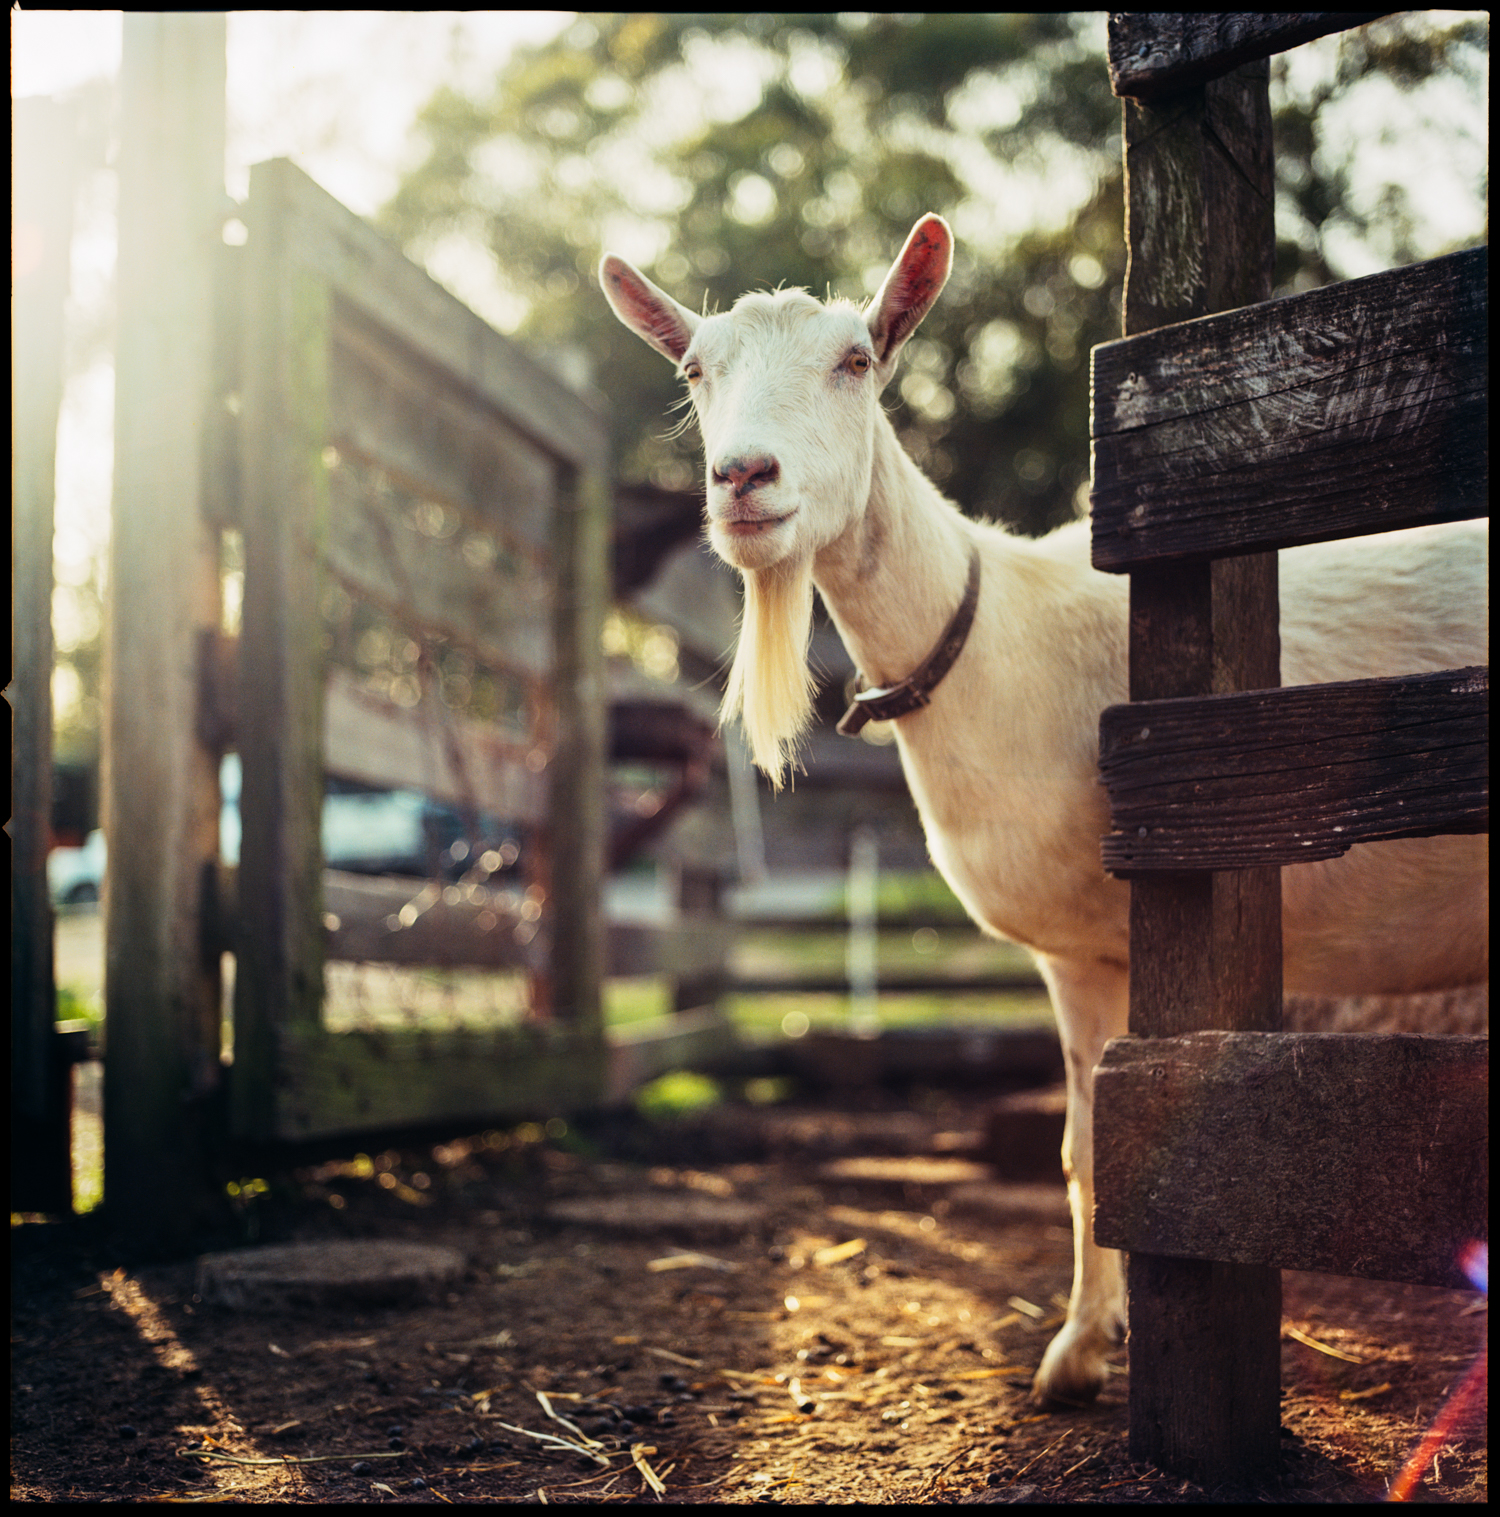 """Grain the Goat"" by Nathan DeHart"